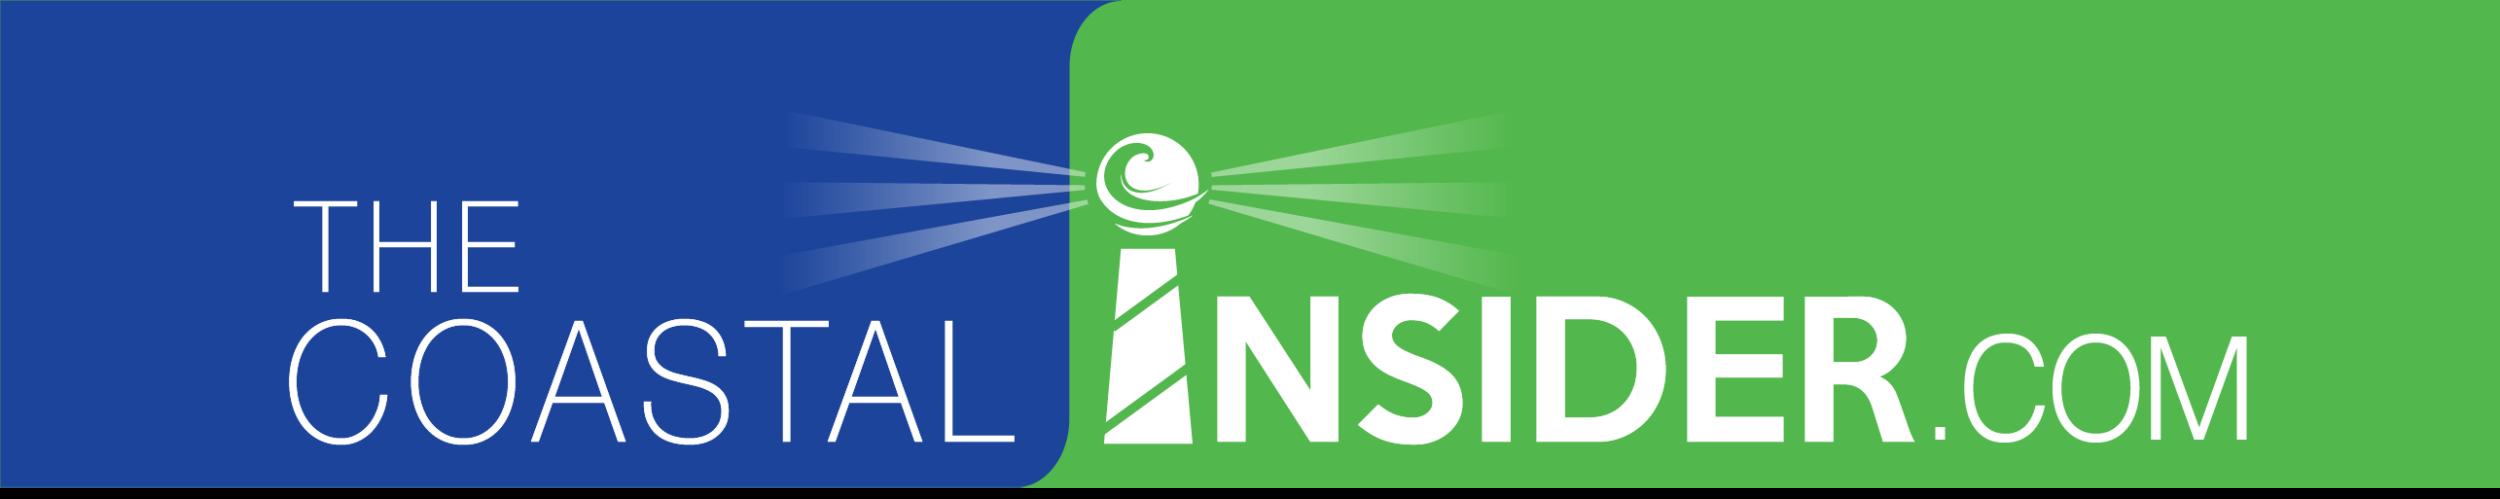 The Coastal Insider Logo